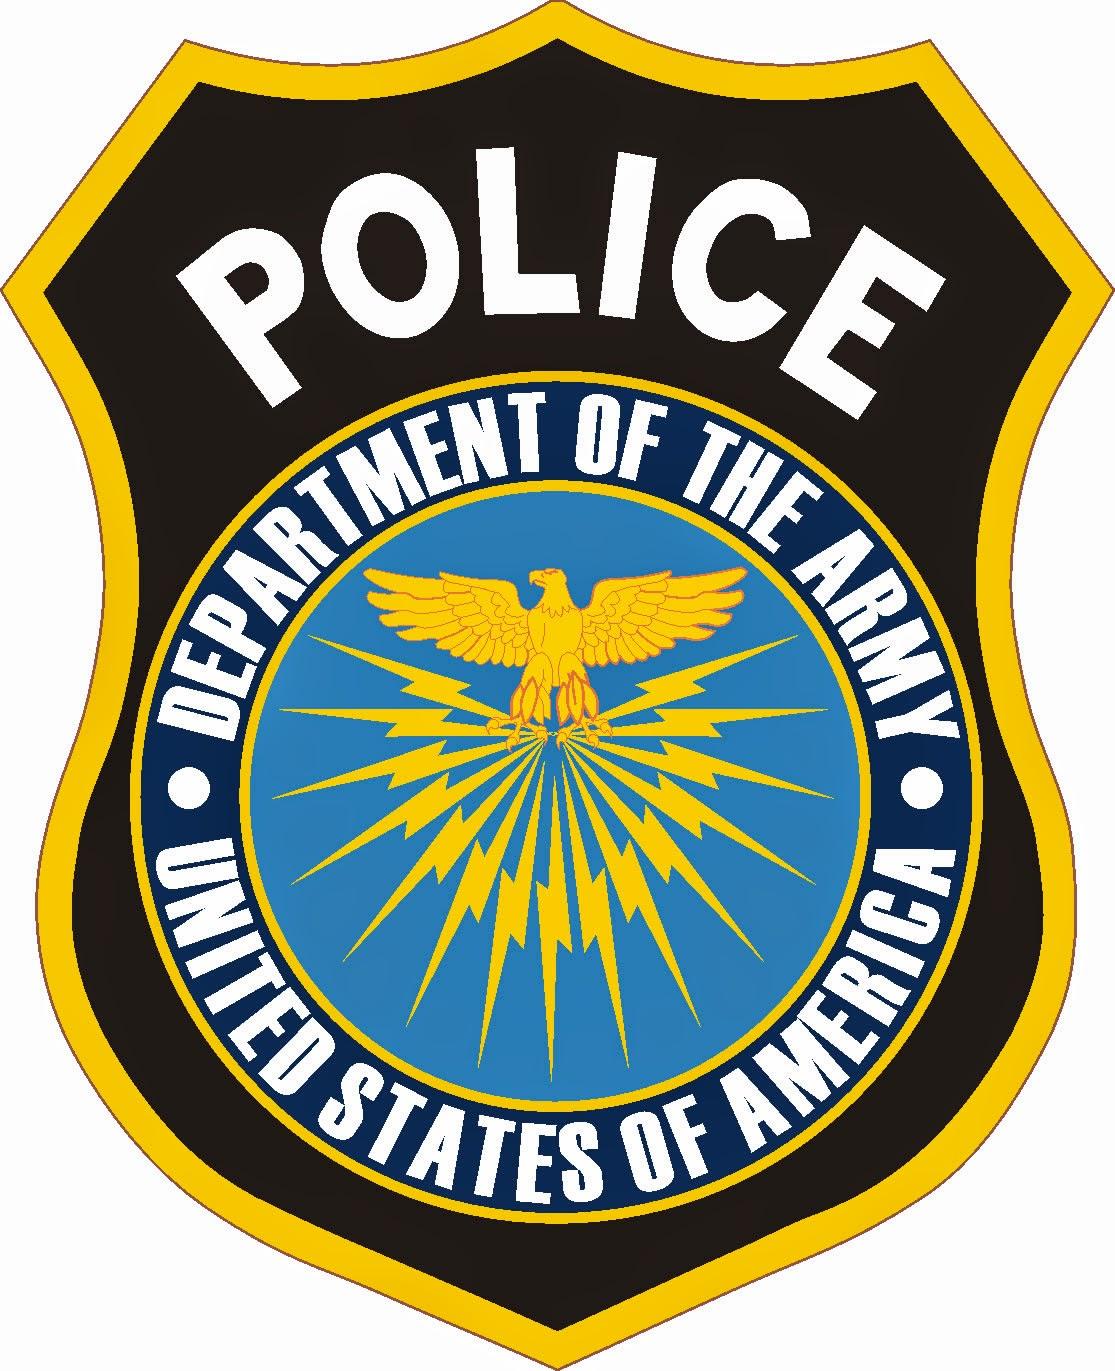 2423delozier rsu police design process rh 2423delozier blogspot com police logos and sayings police logo shirts